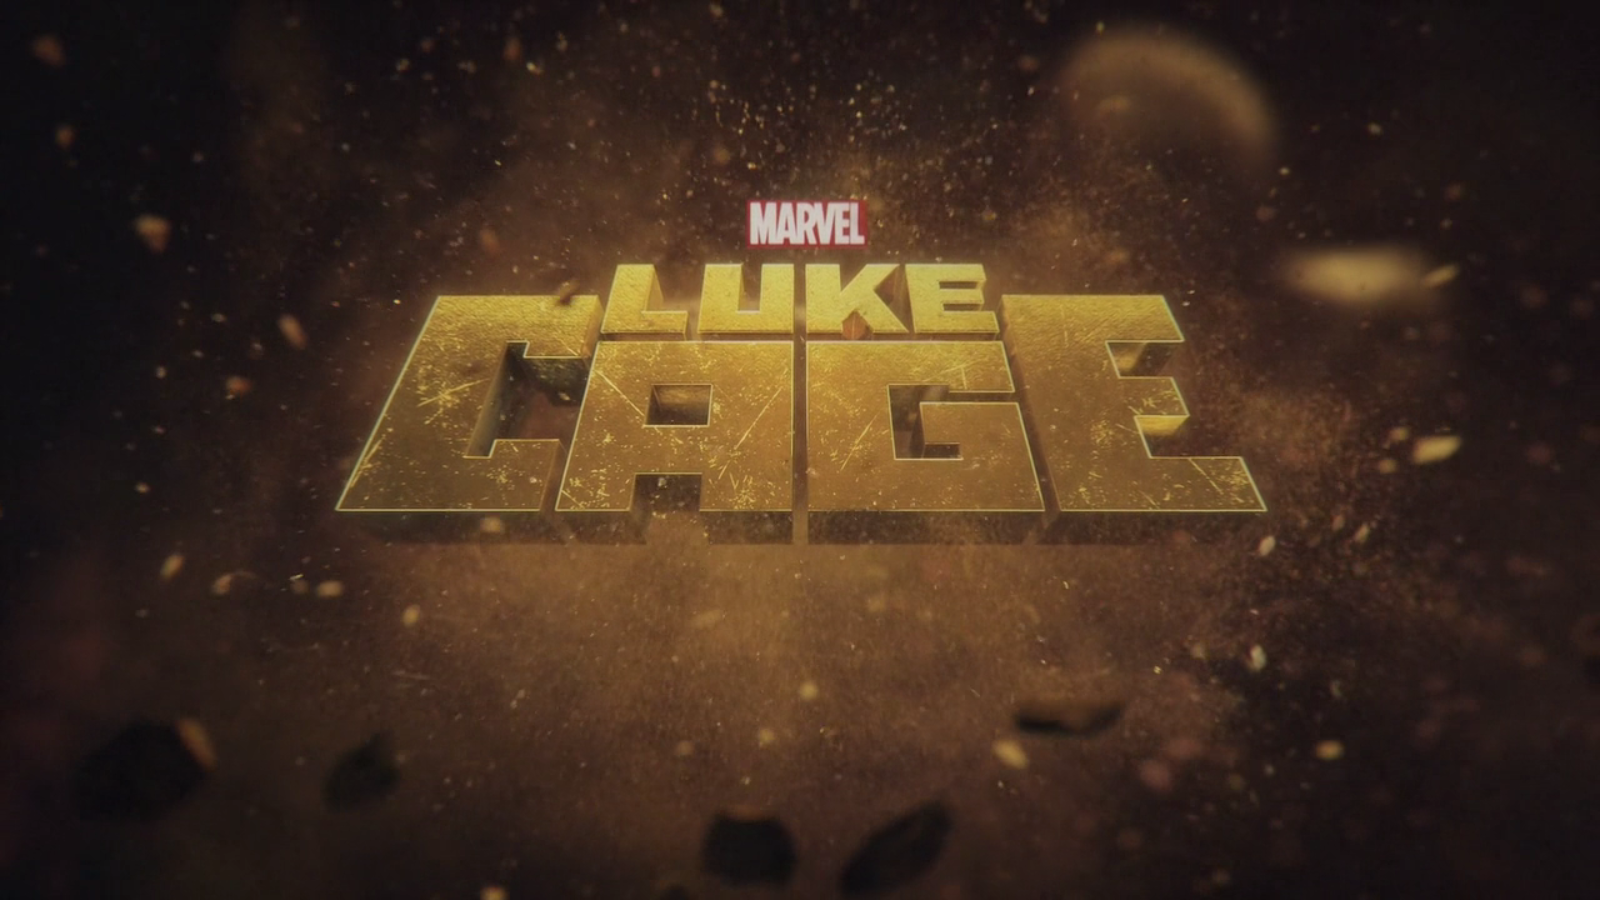 Luke Cage (TV series) | Marvel Cinematic Universe Wiki